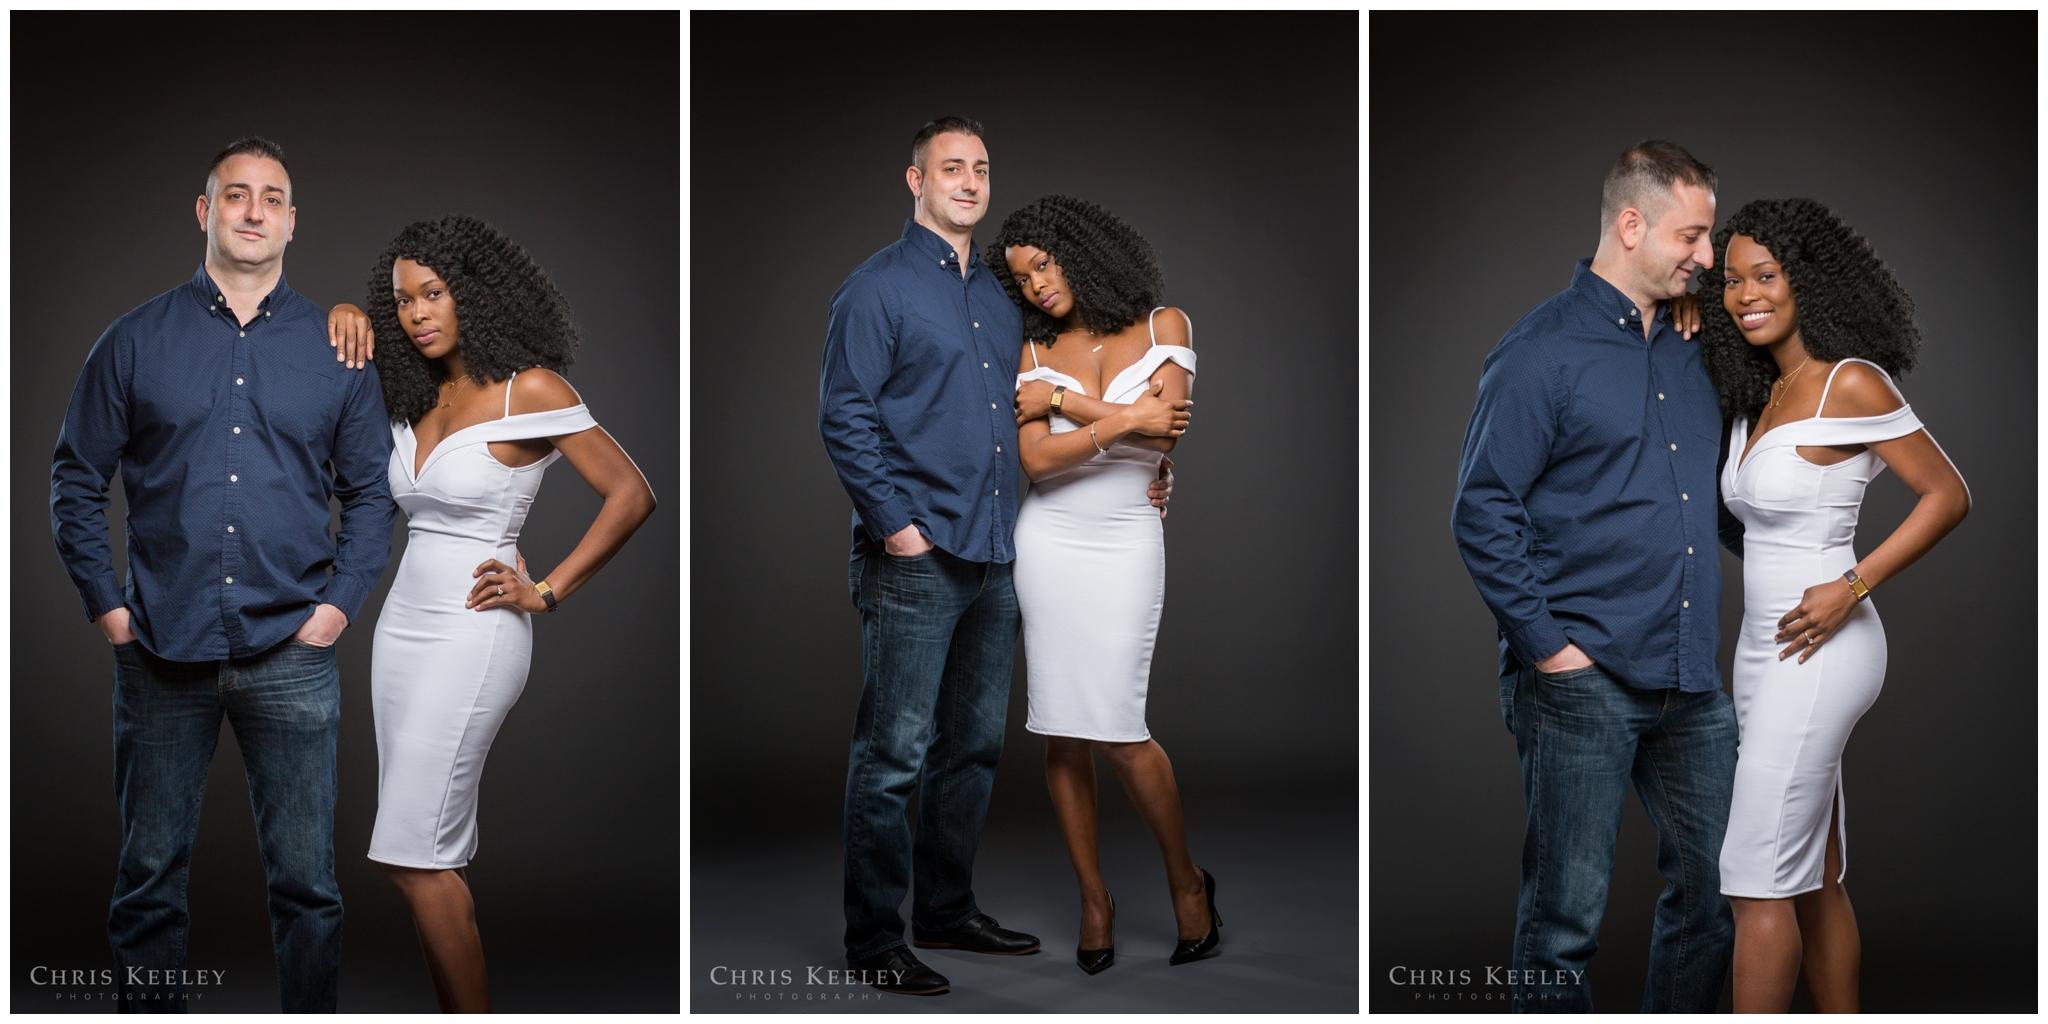 chris-keeley-photography-dover-new-hampshire-engagement-wedding-10.jpg